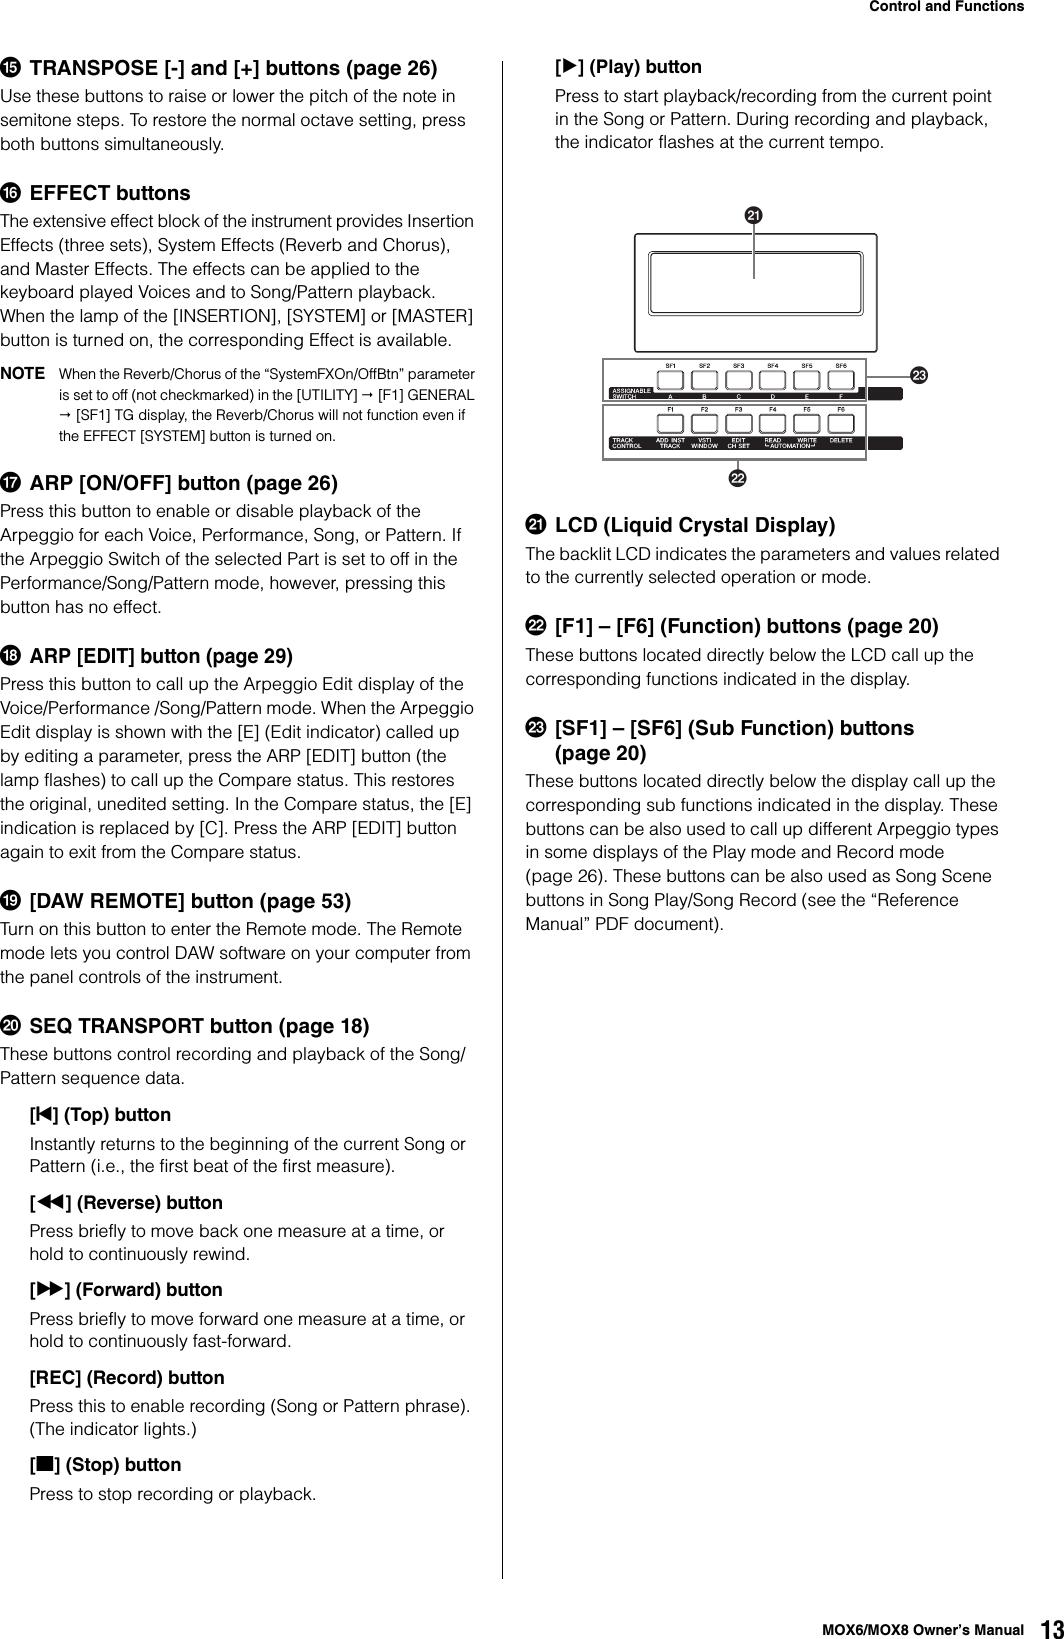 Yamaha MOX6 / MOX8 Owner's Manual MOX6/MOX8 Owner's Mox6mox8